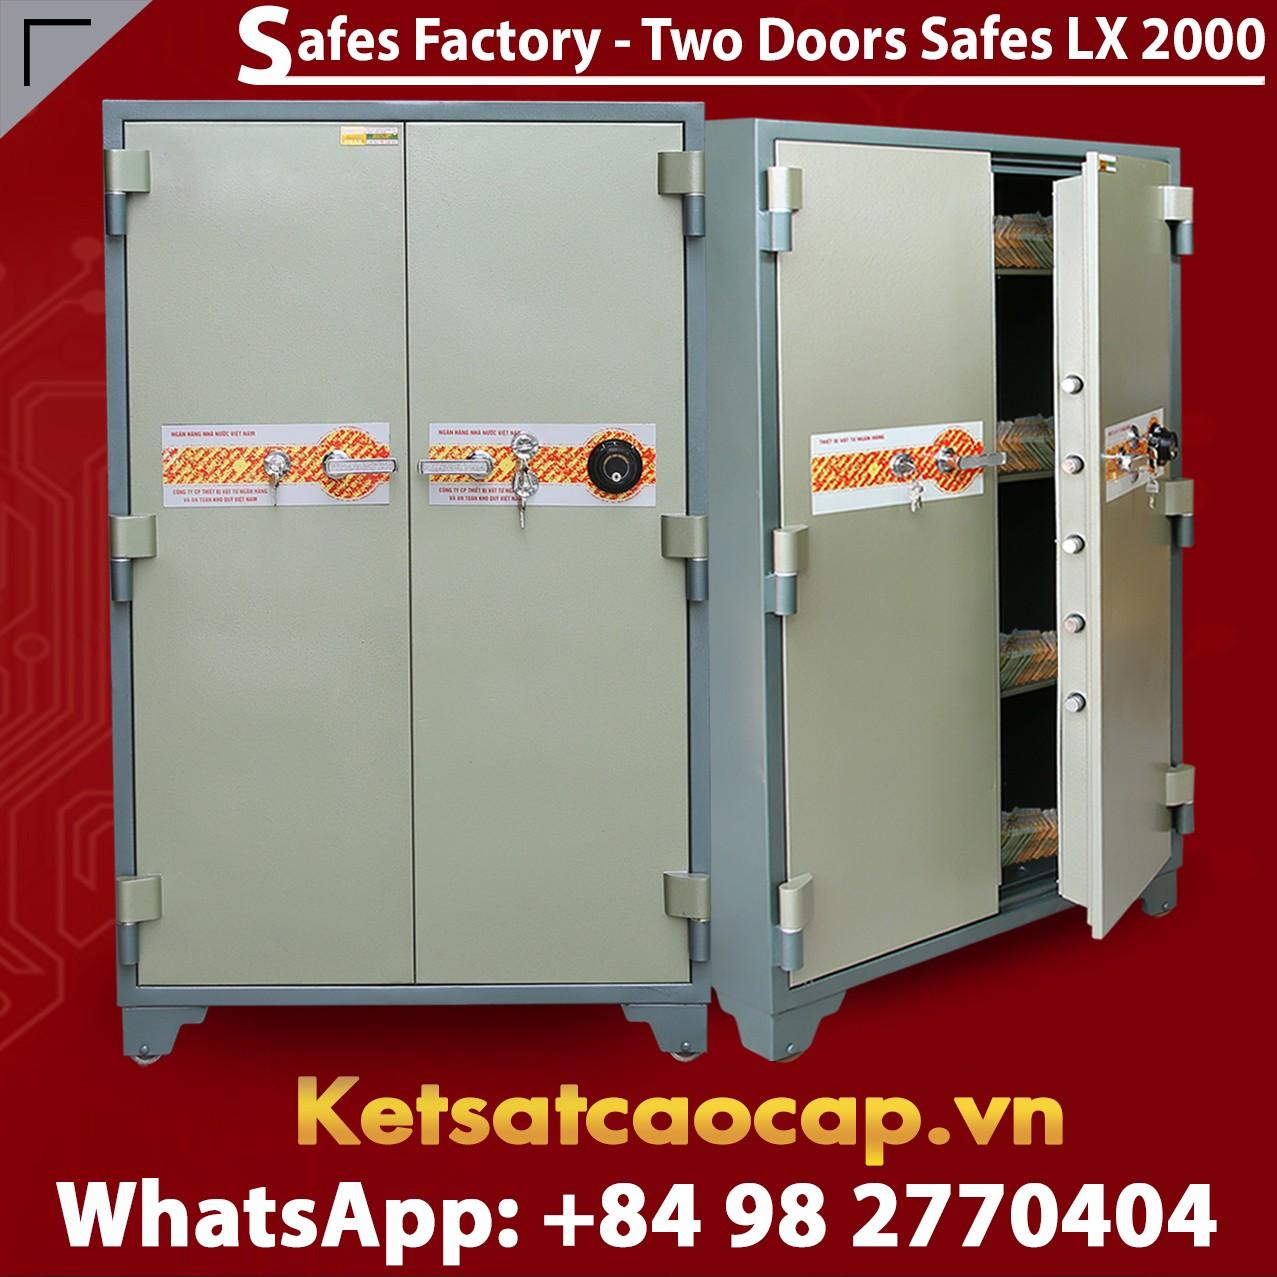 Bank Safes LX2000 DK Two Doors Mechanical Fireproof